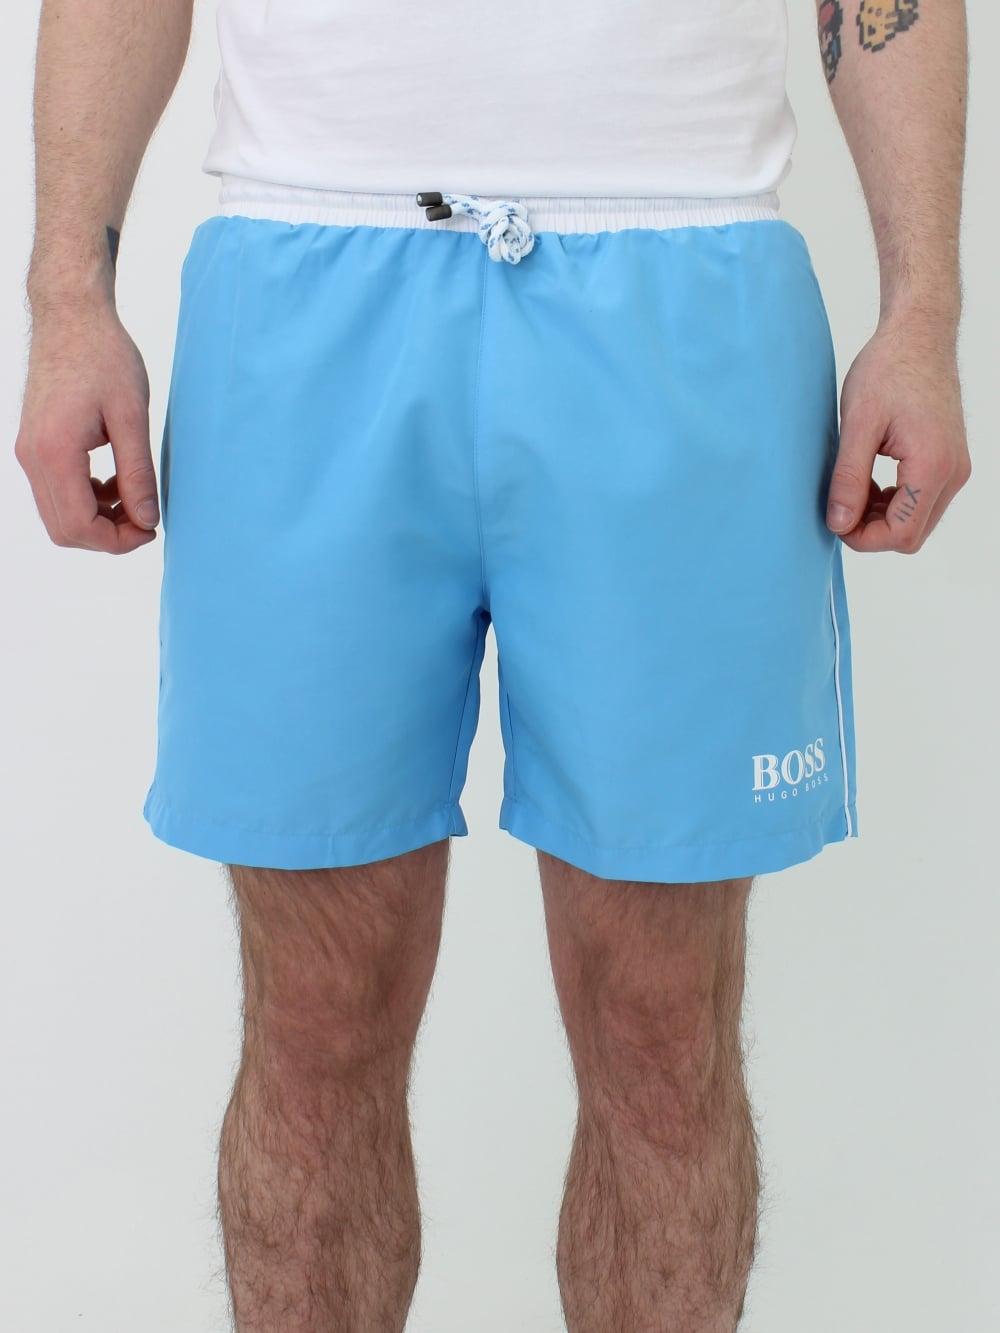 da8418d857 Swim Hugo Boss BOSS Mens Starfish Swim Trunk 50269488